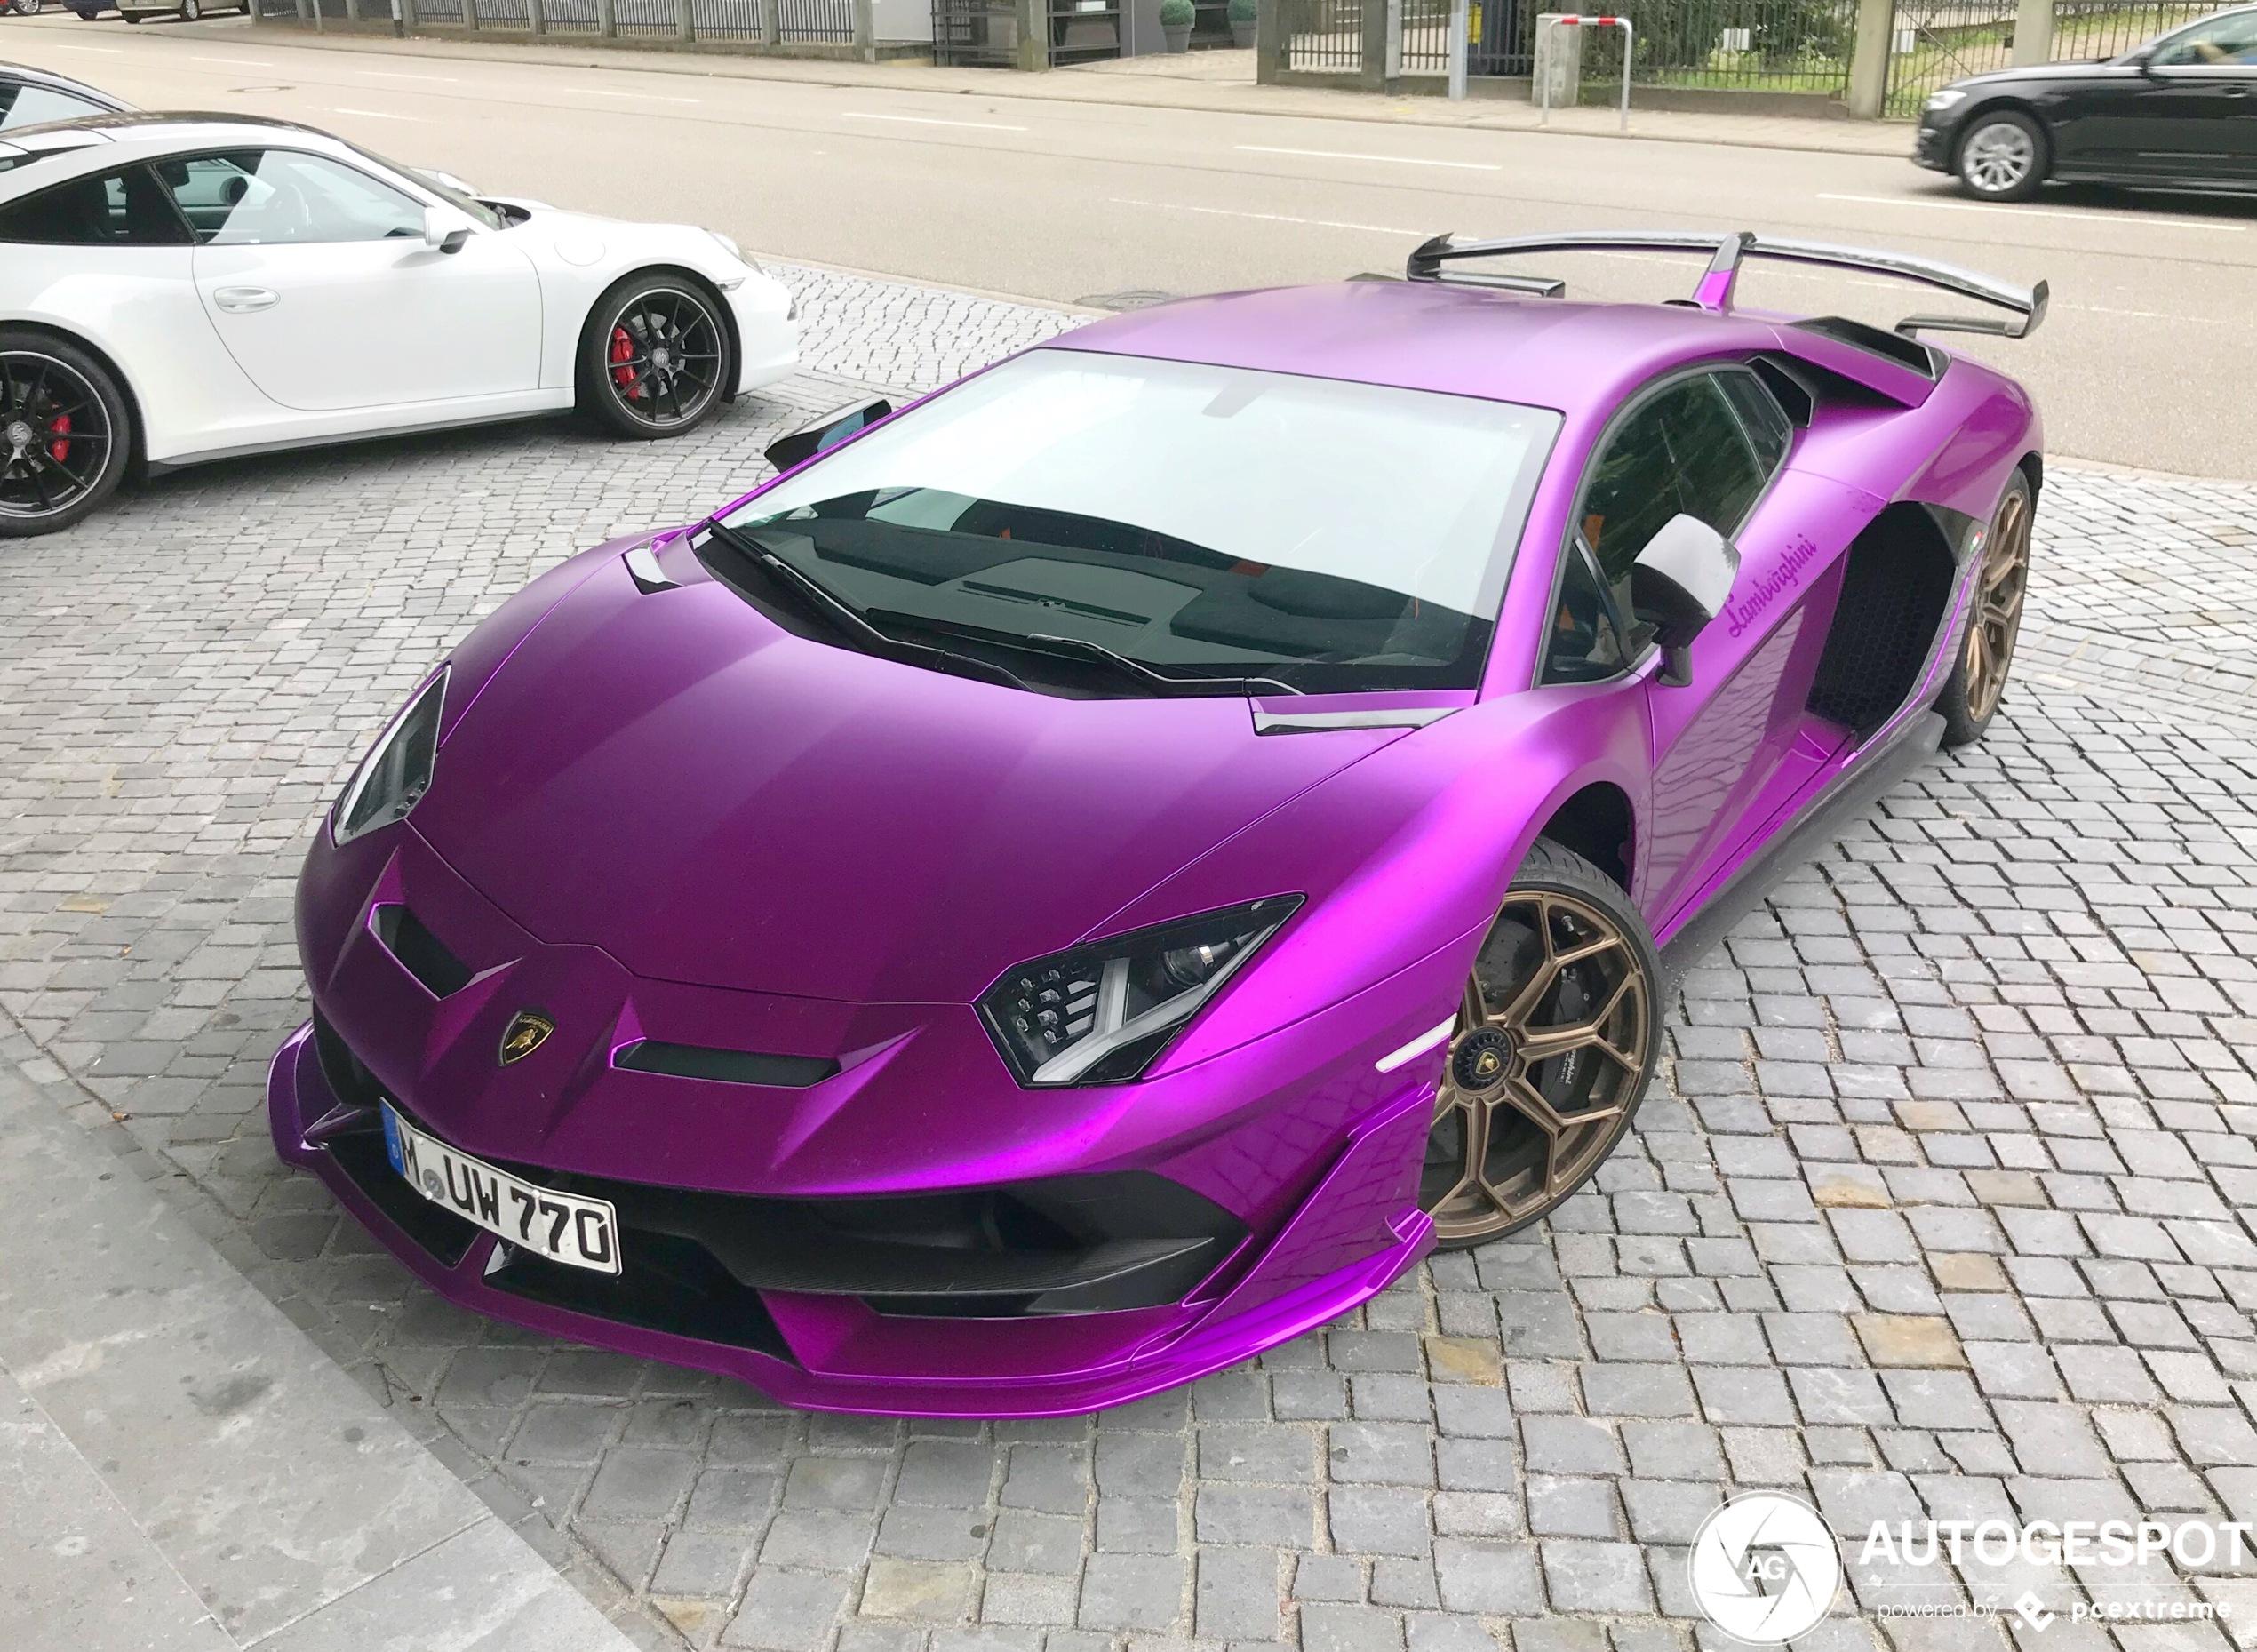 Opvallender kon deze Lamborghini niet